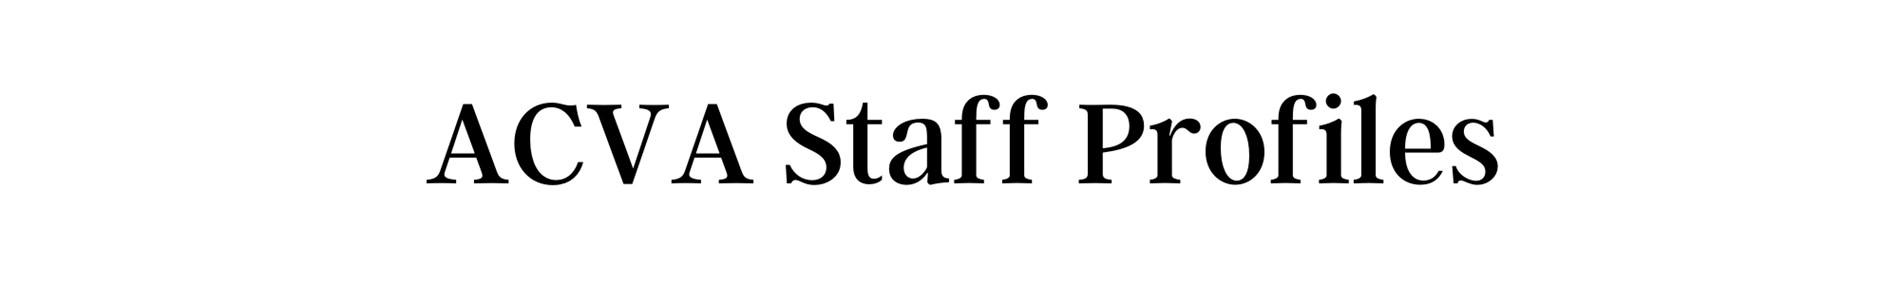 staff profiles header